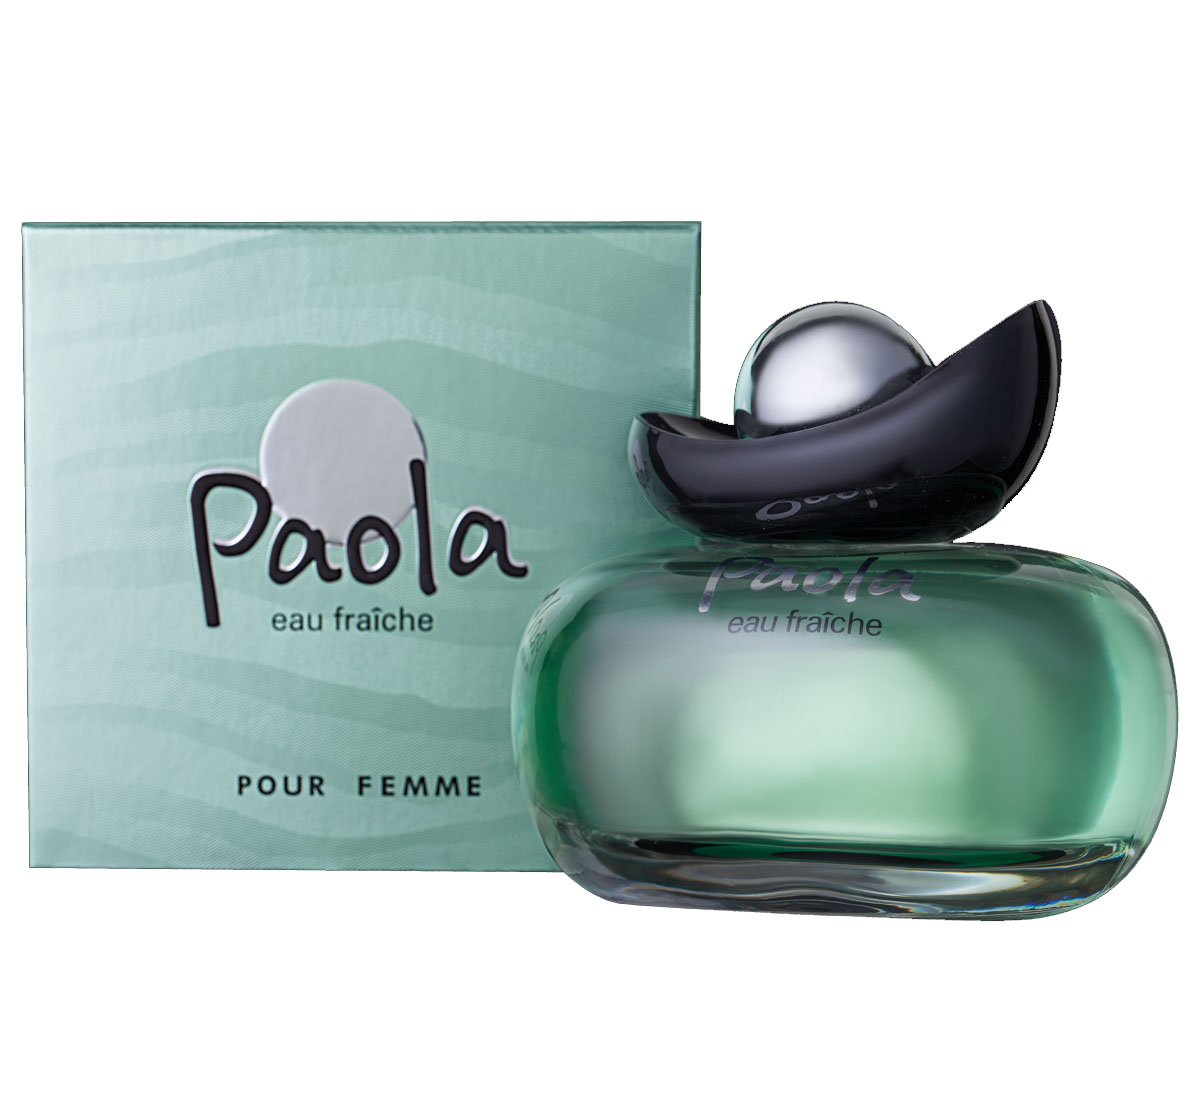 Купить Парфюмерная вода Magruss Paola eau fraiche, 100 мл